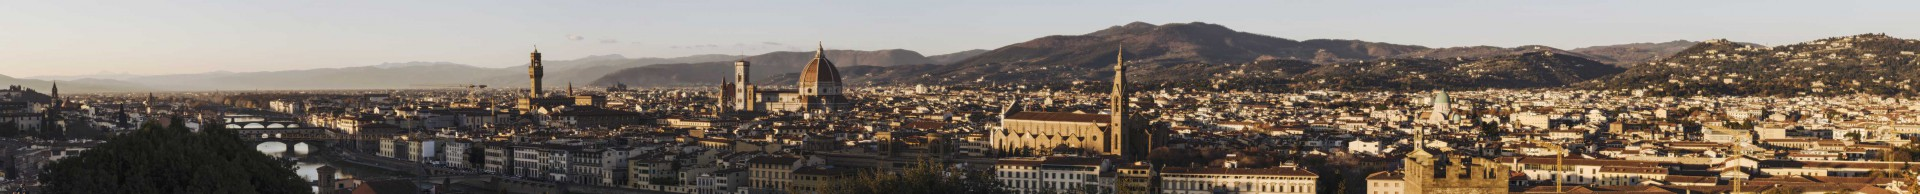 Michele Settembre - Fotografia in Firenze - Panorama da Piazzale Michelangelo